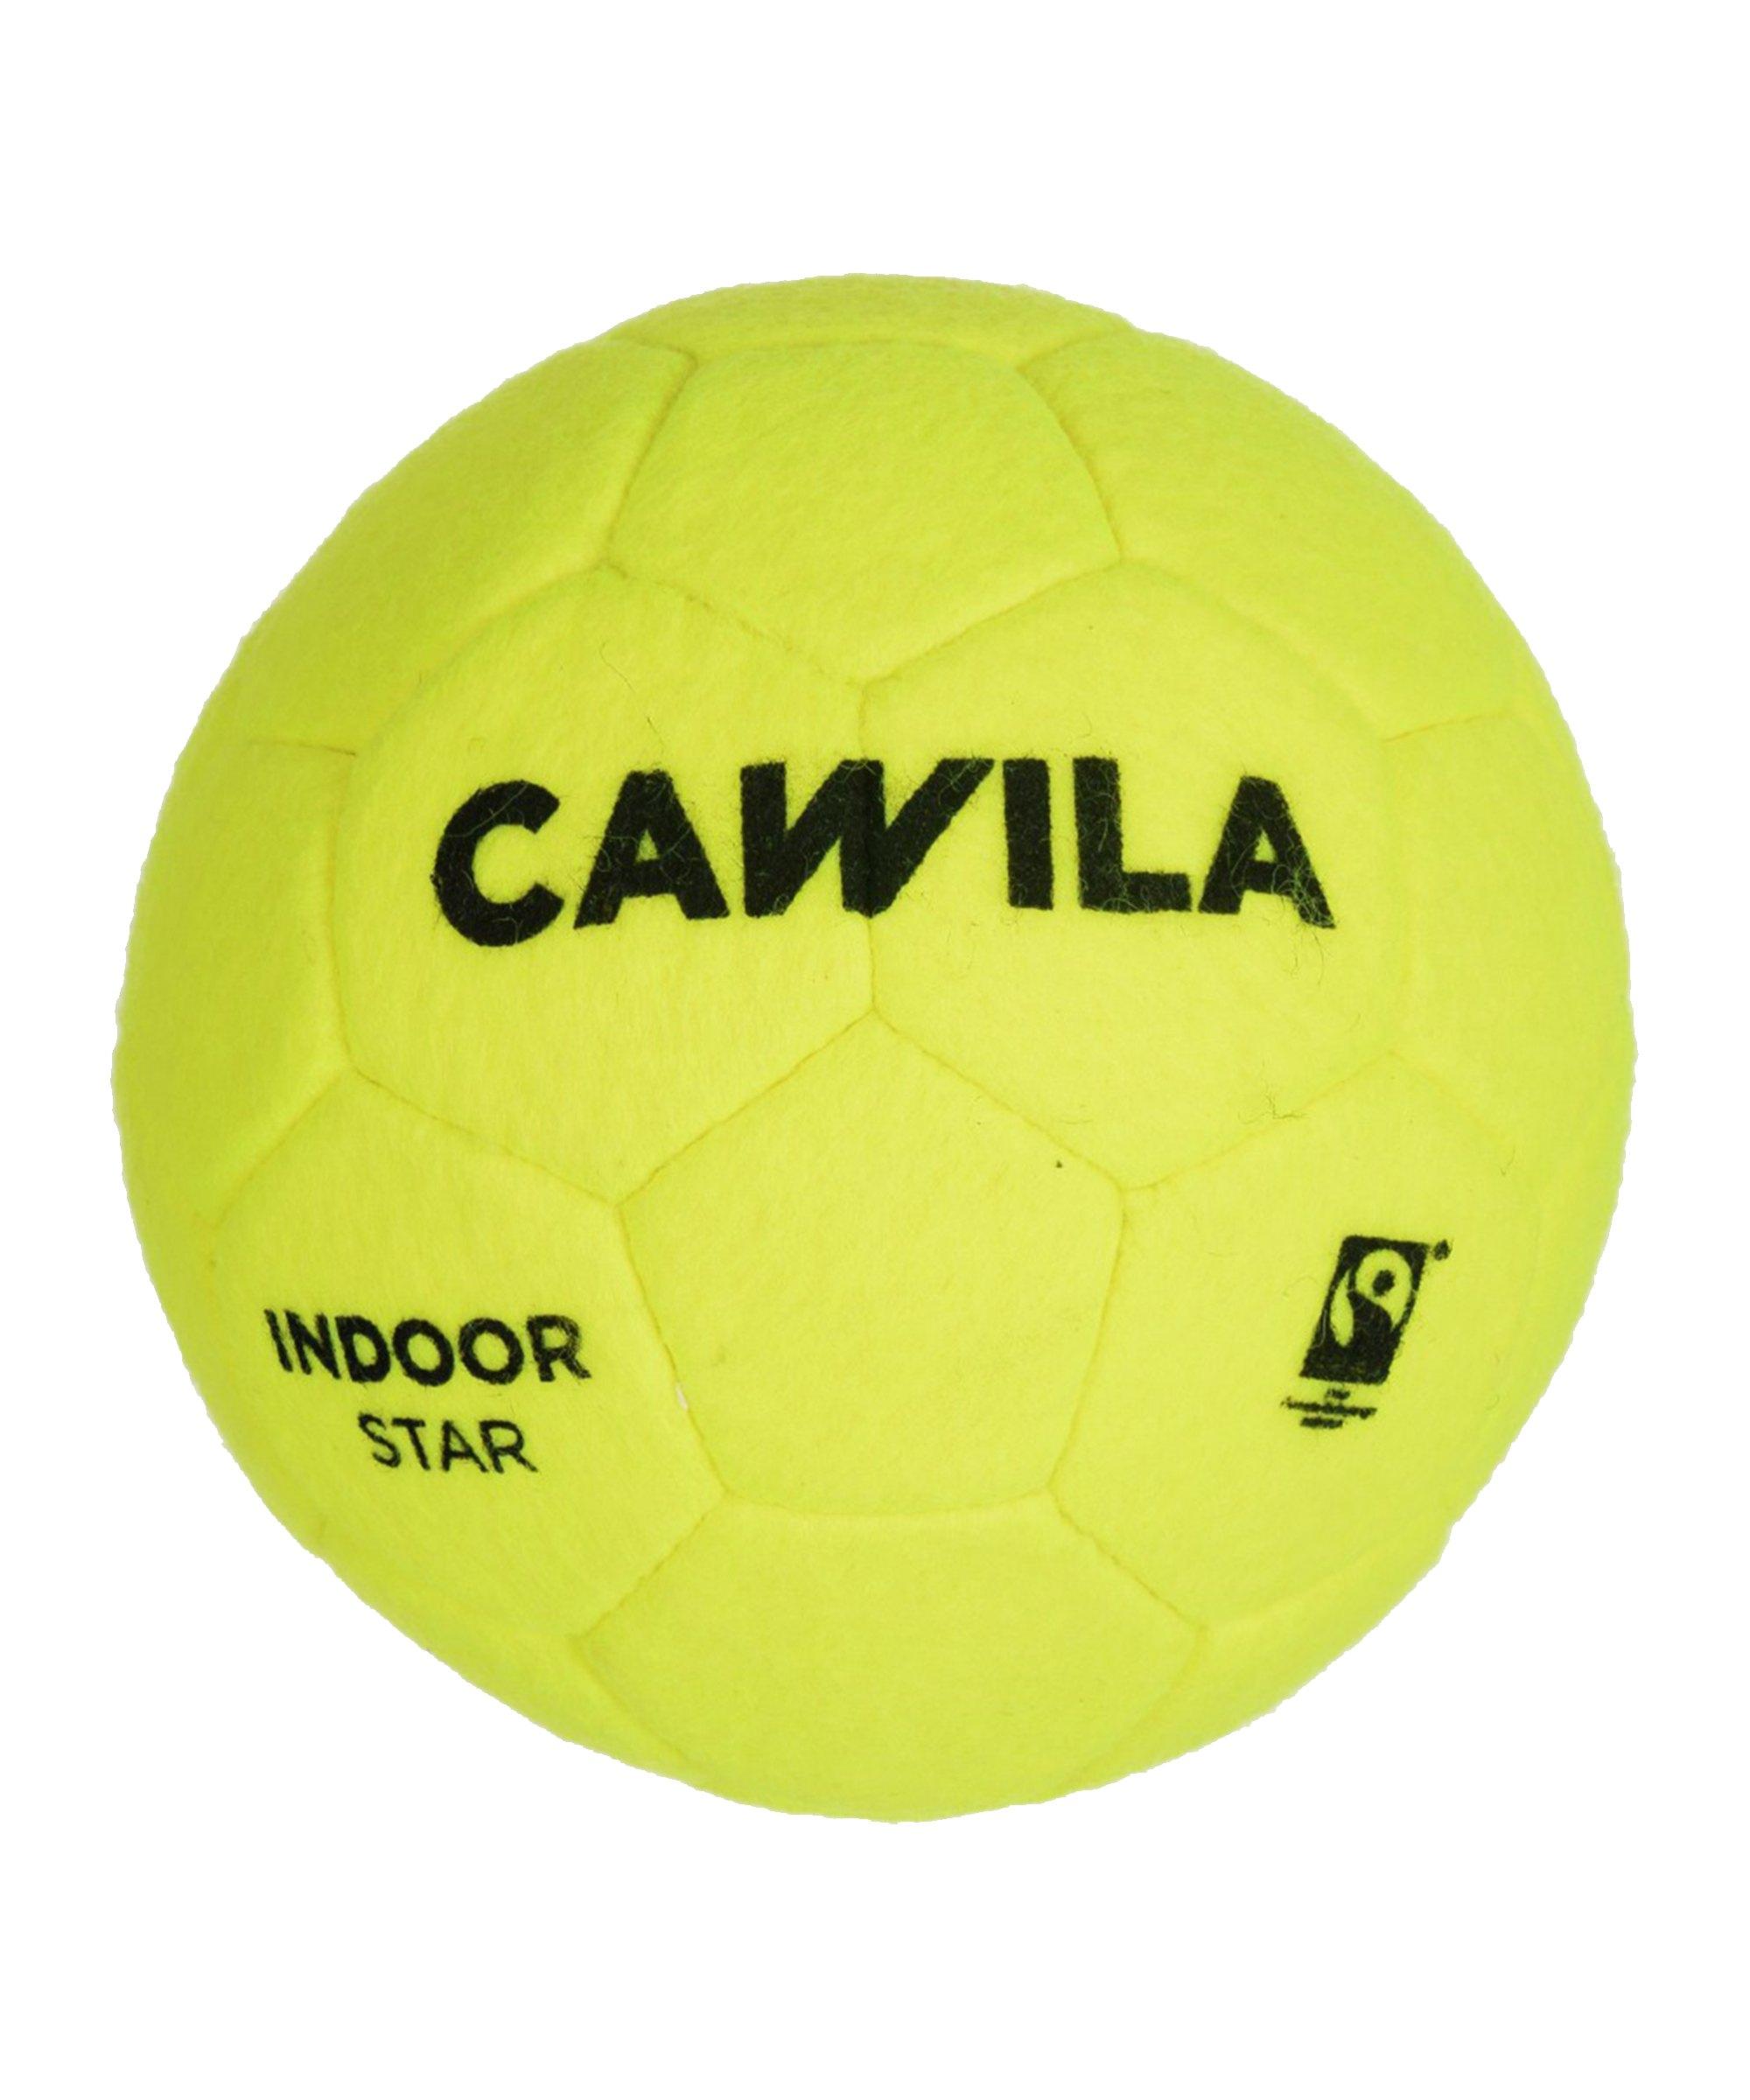 Cawila Fussball Indoor Star 5 Gelb - gelb